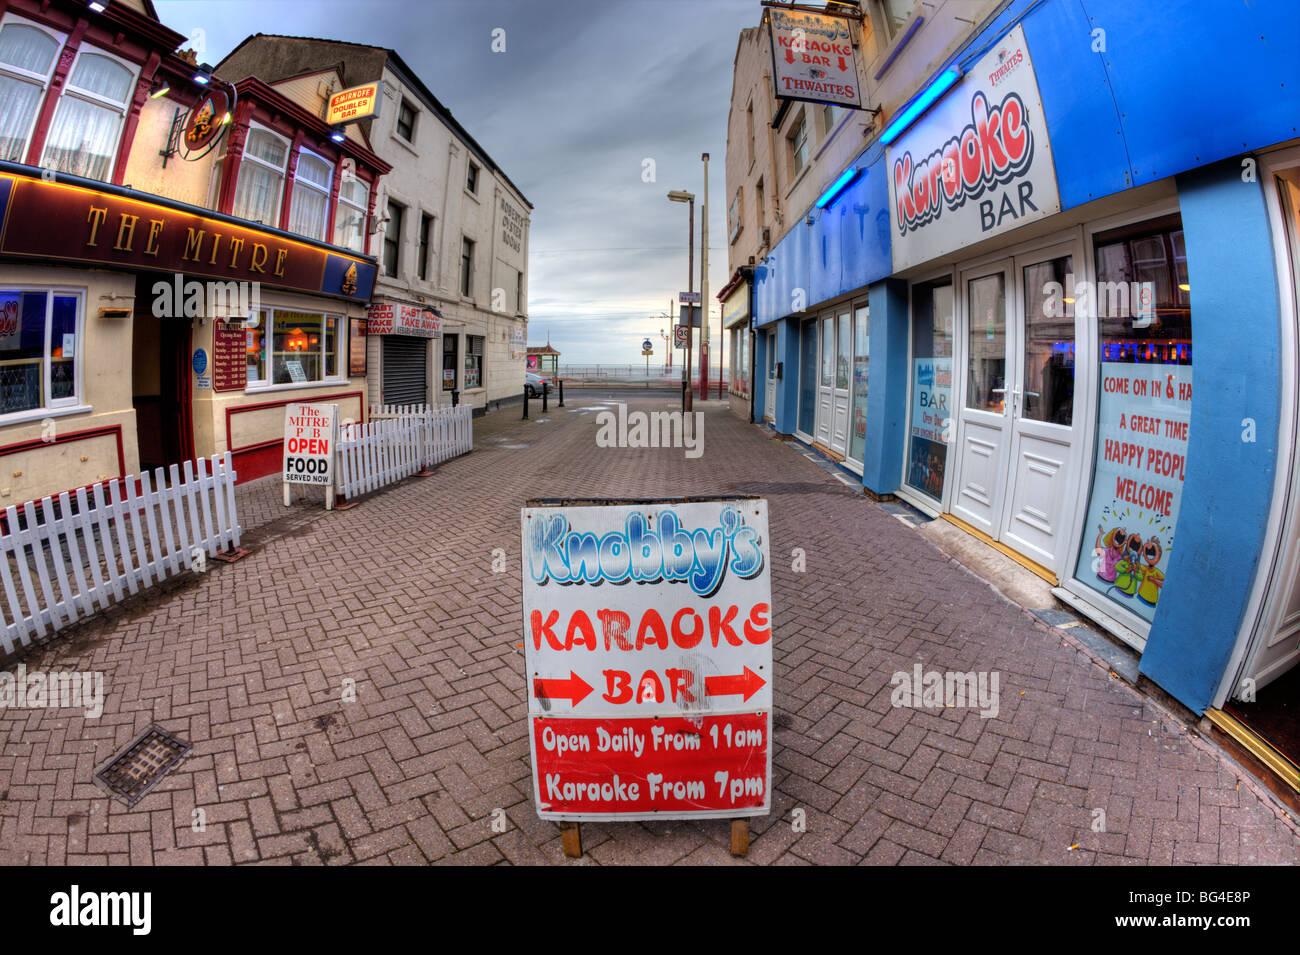 Blackpool karaoke venue - Stock Image